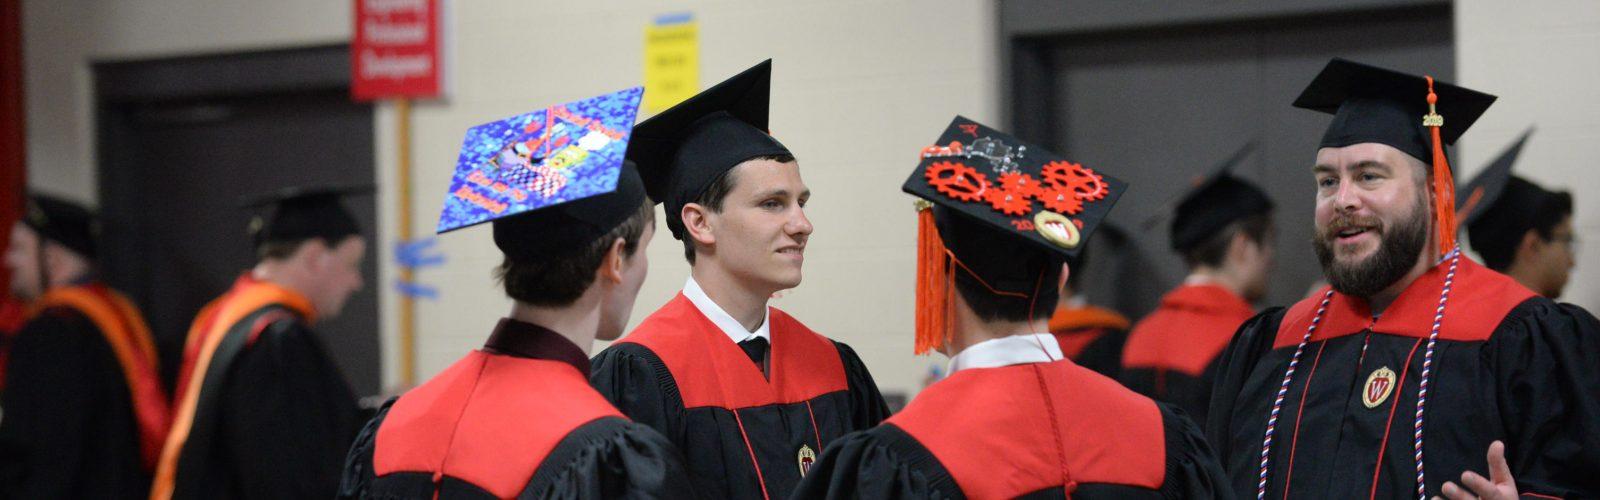 Uw Graduation Ceremony 2020.Graduate Recognition College Of Engineering Uw Madison